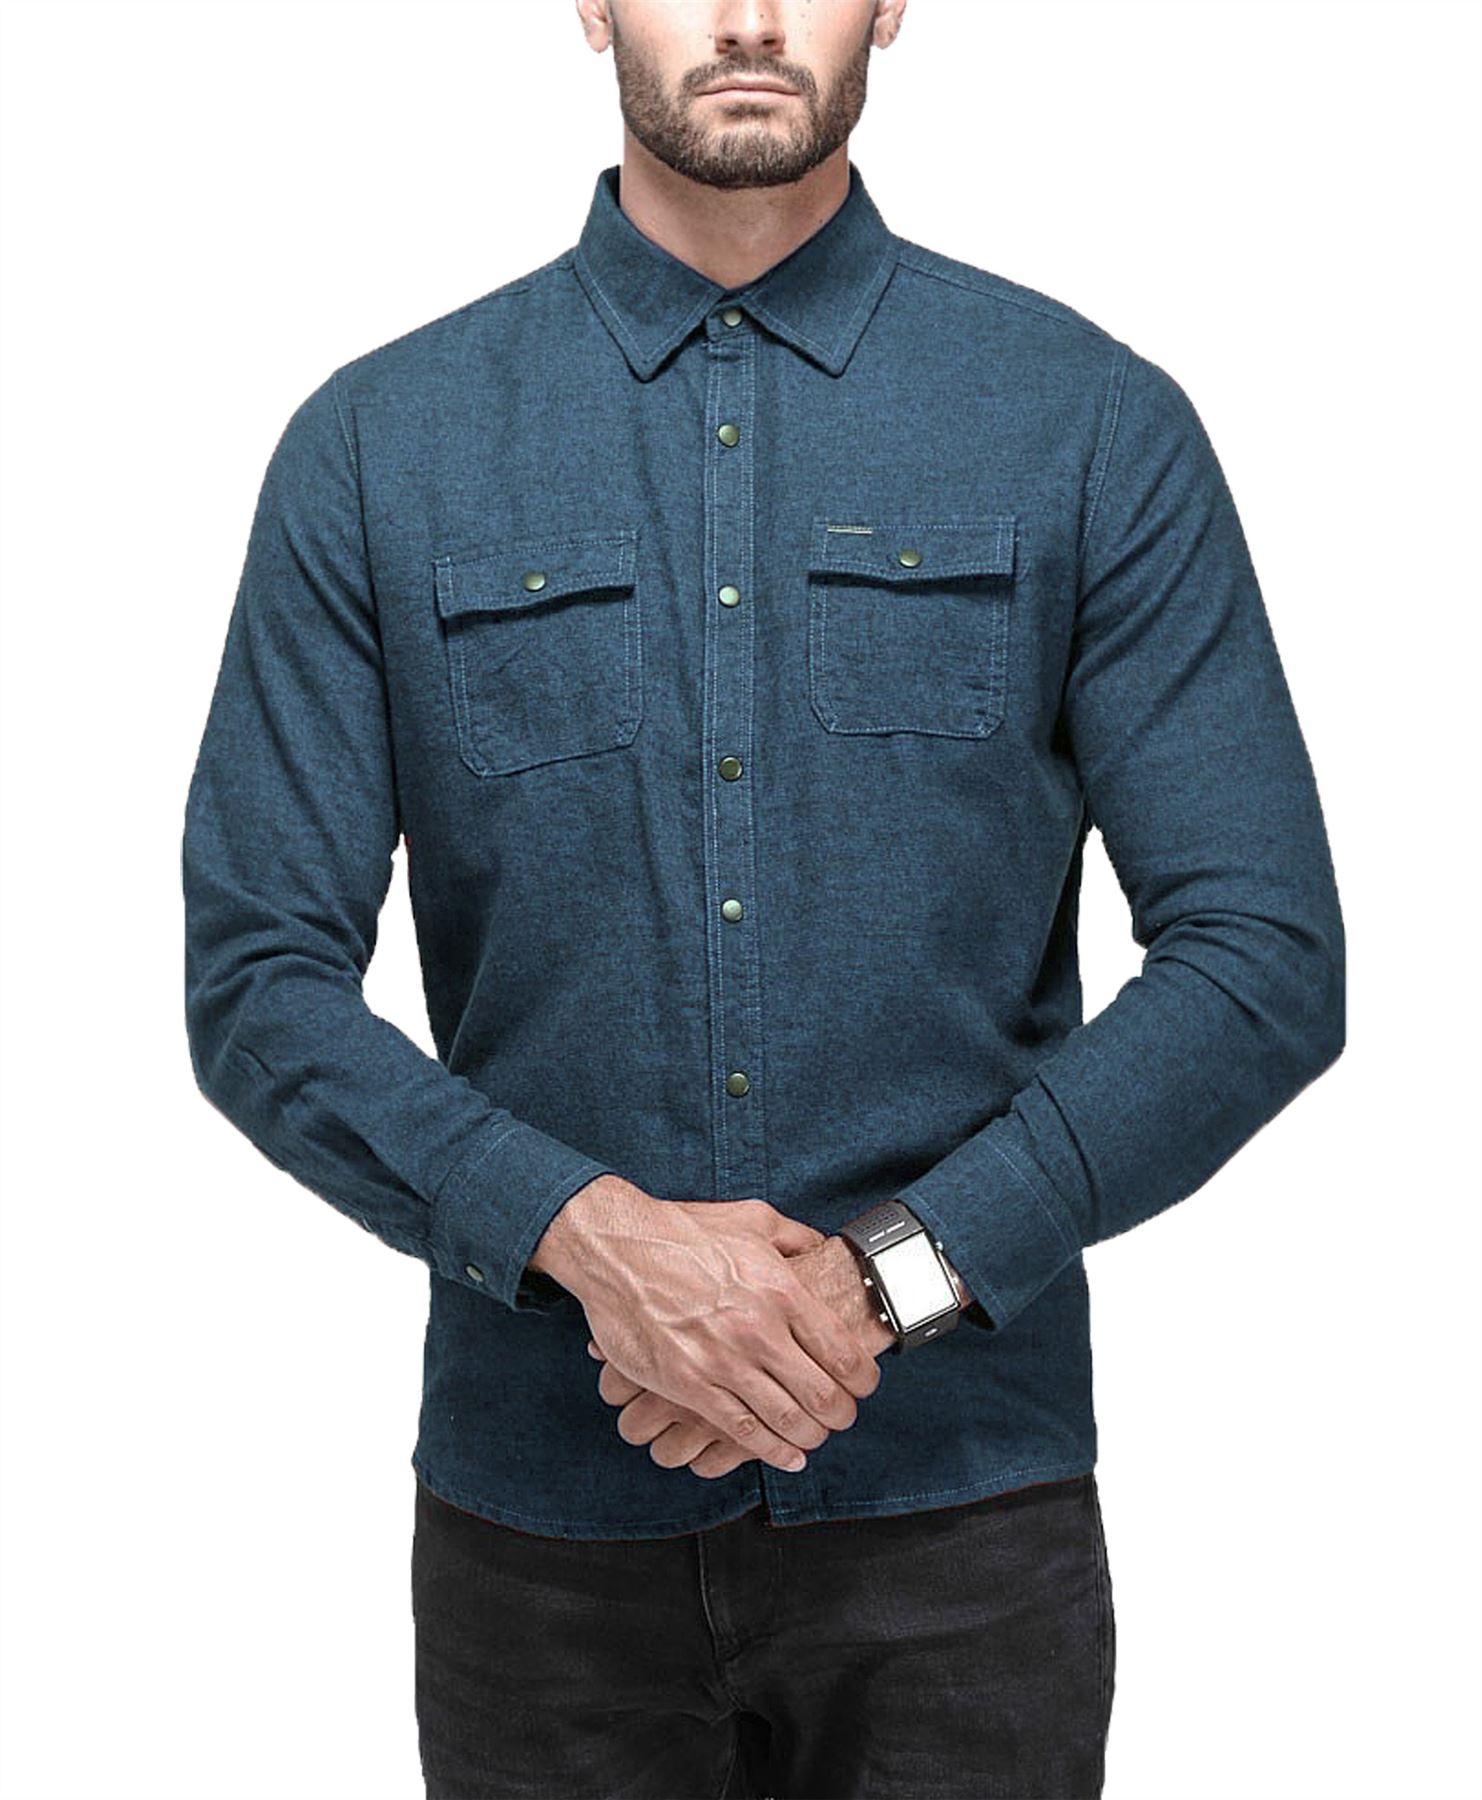 Hombre-Point-Zero-Camisa-Lisa-100-Manga-Larga-De-Algodon-Informal-Elegante